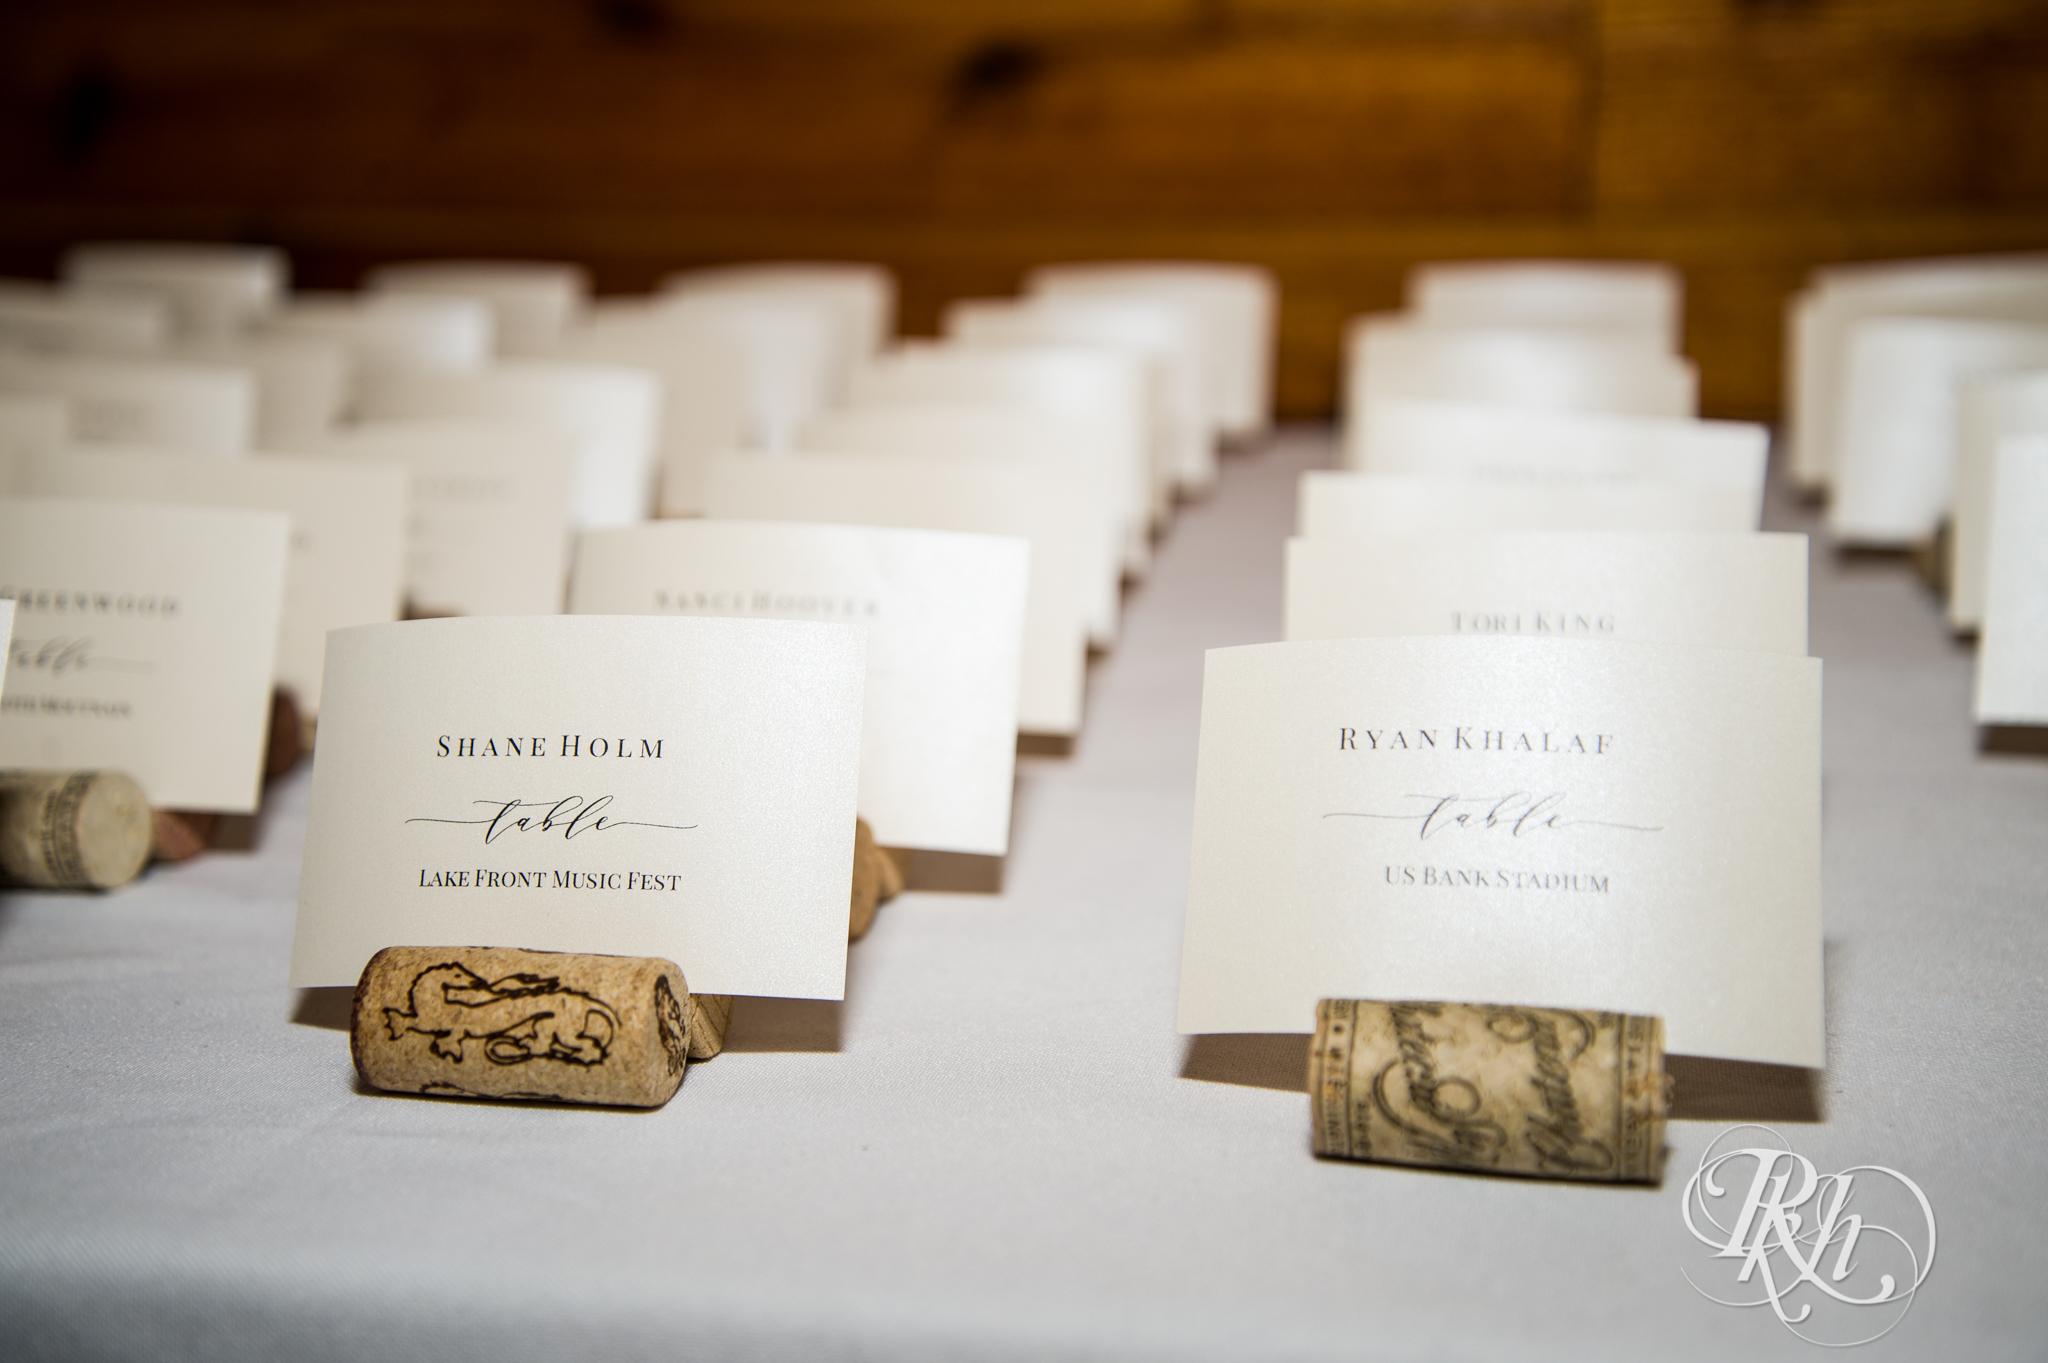 Ally & Nick - Minnesota Wedding Photography - Next Chapter Winery - RKH Images - Blog (7 of 57).jpg